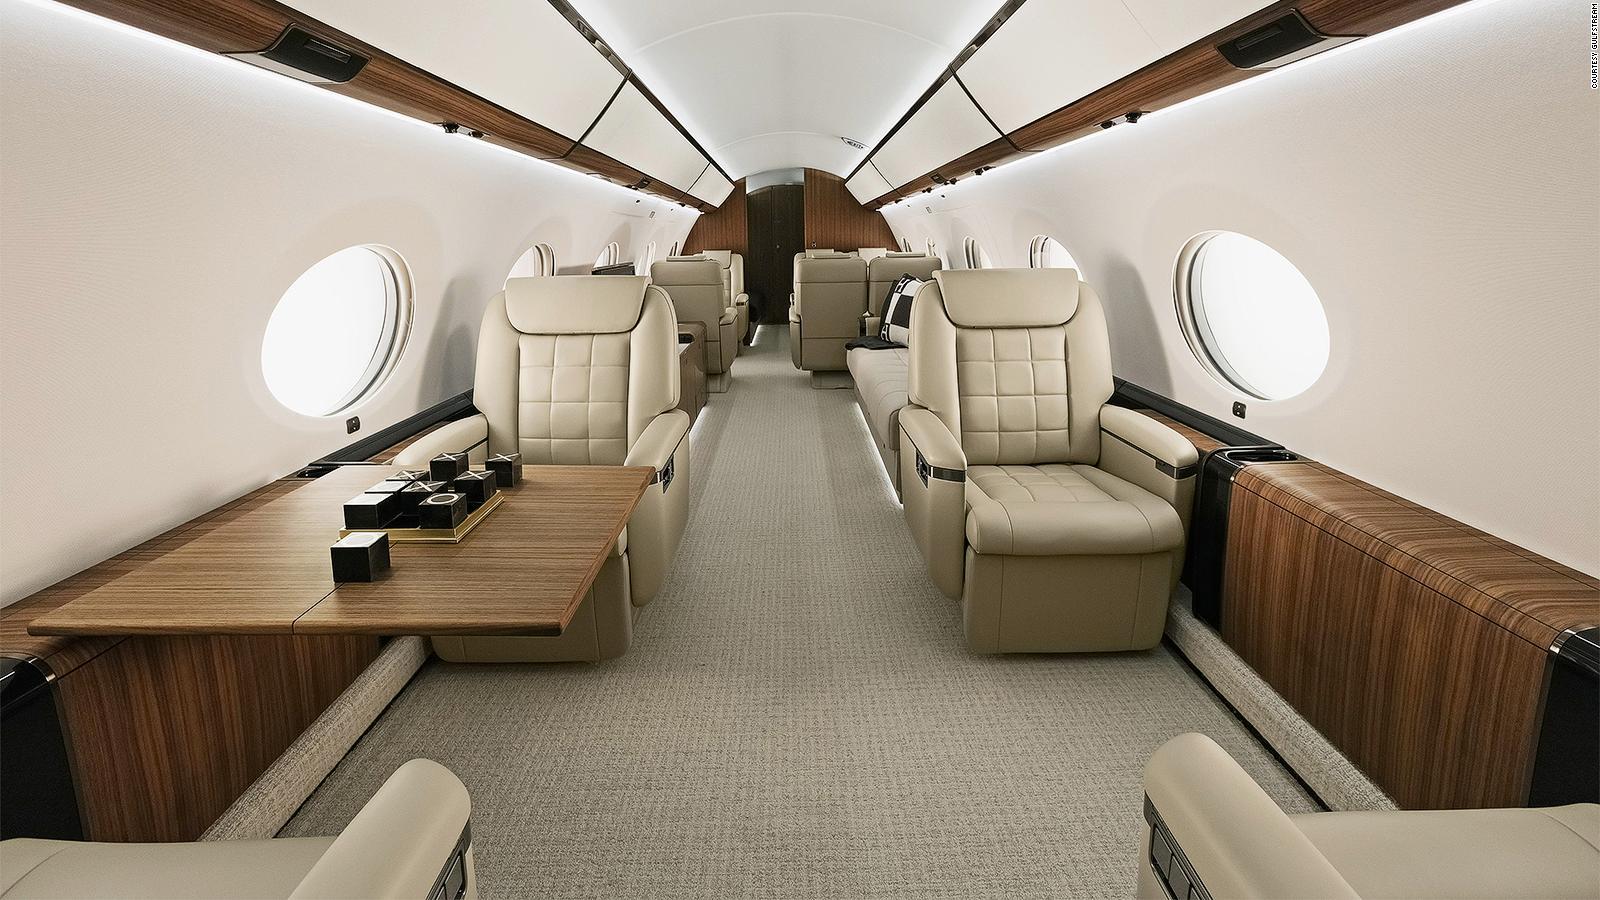 Bombardier Global 7500 Vs Gulfstream G650 Battle Of The